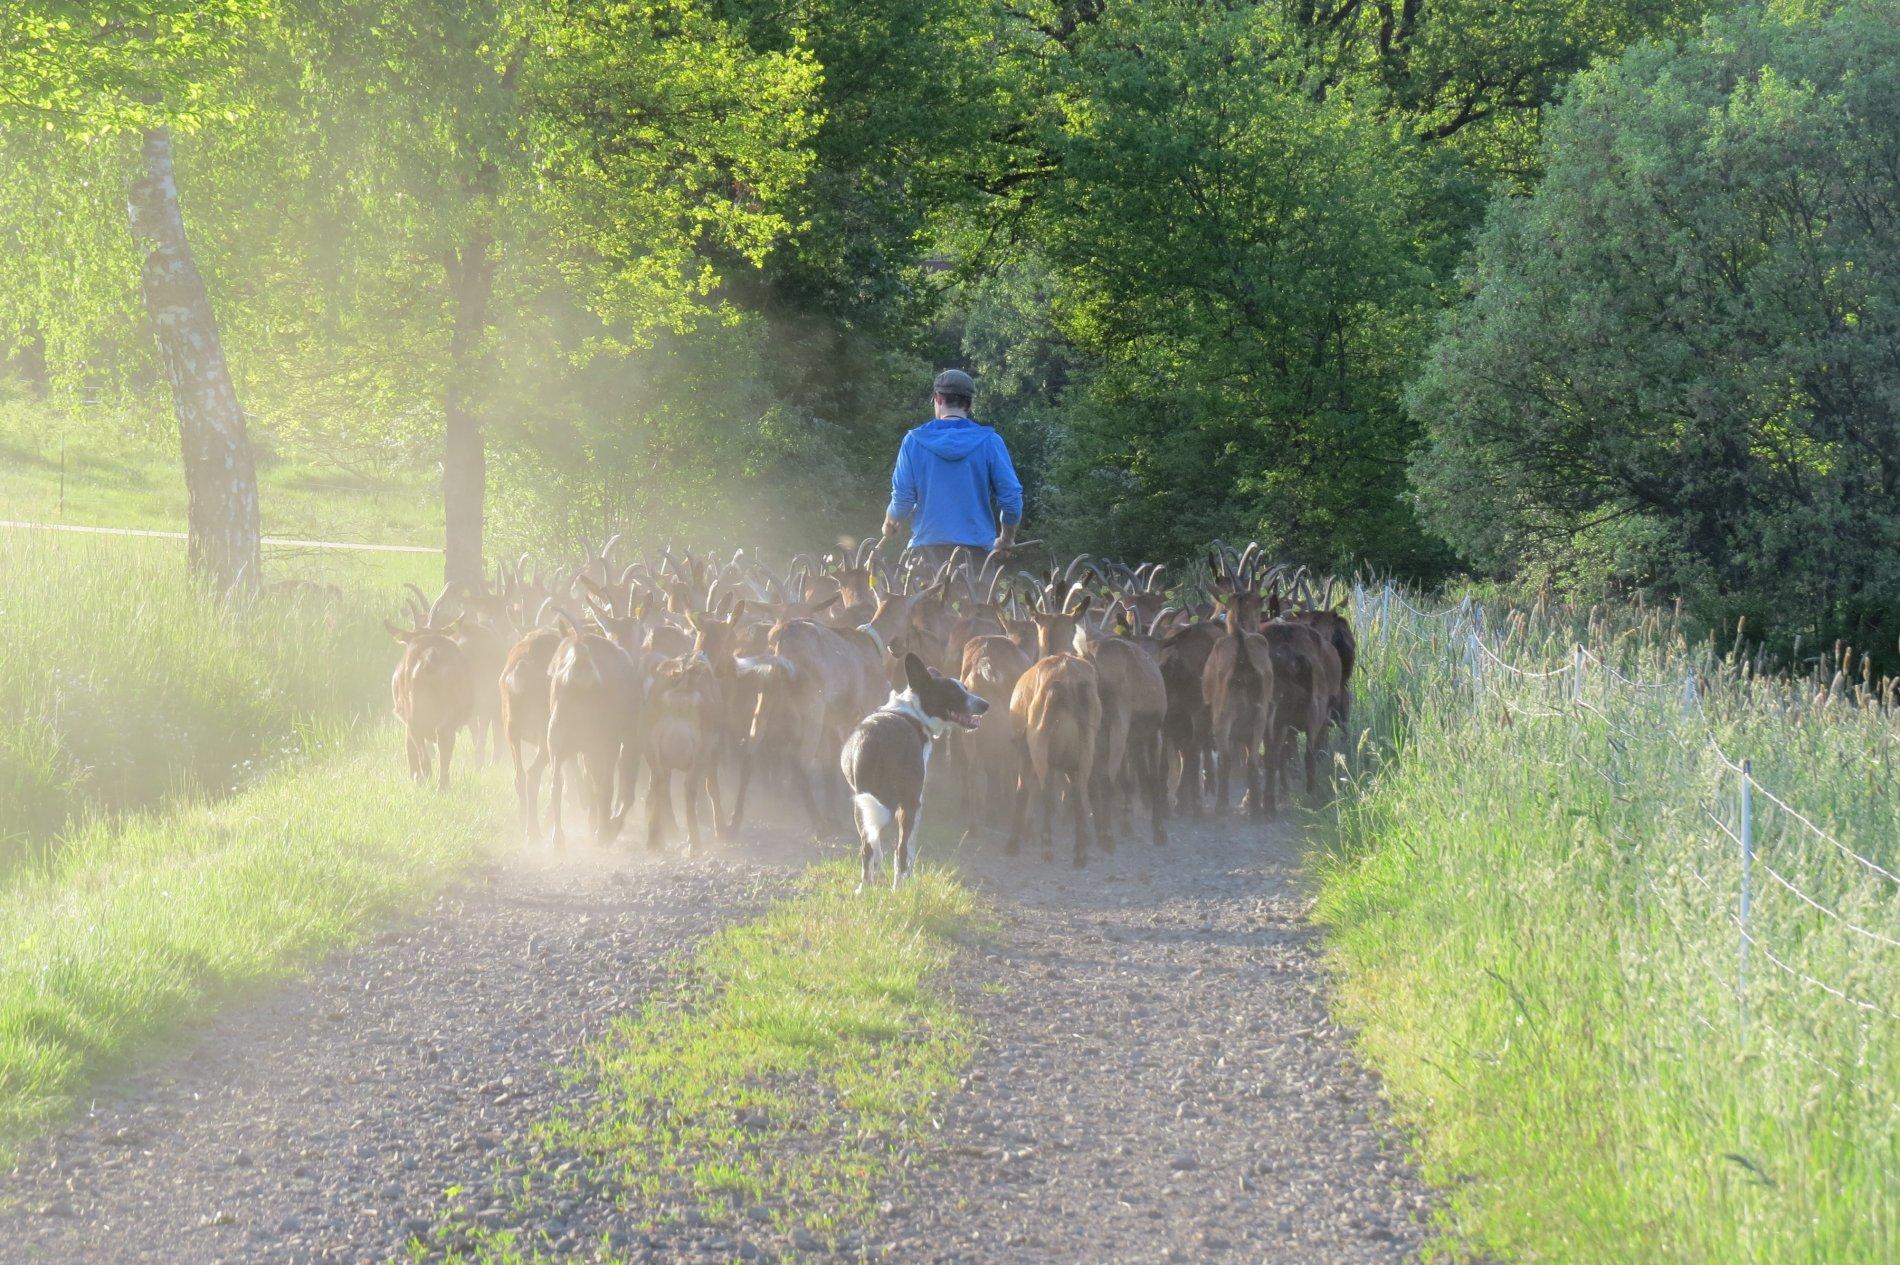 Goats monastery farms